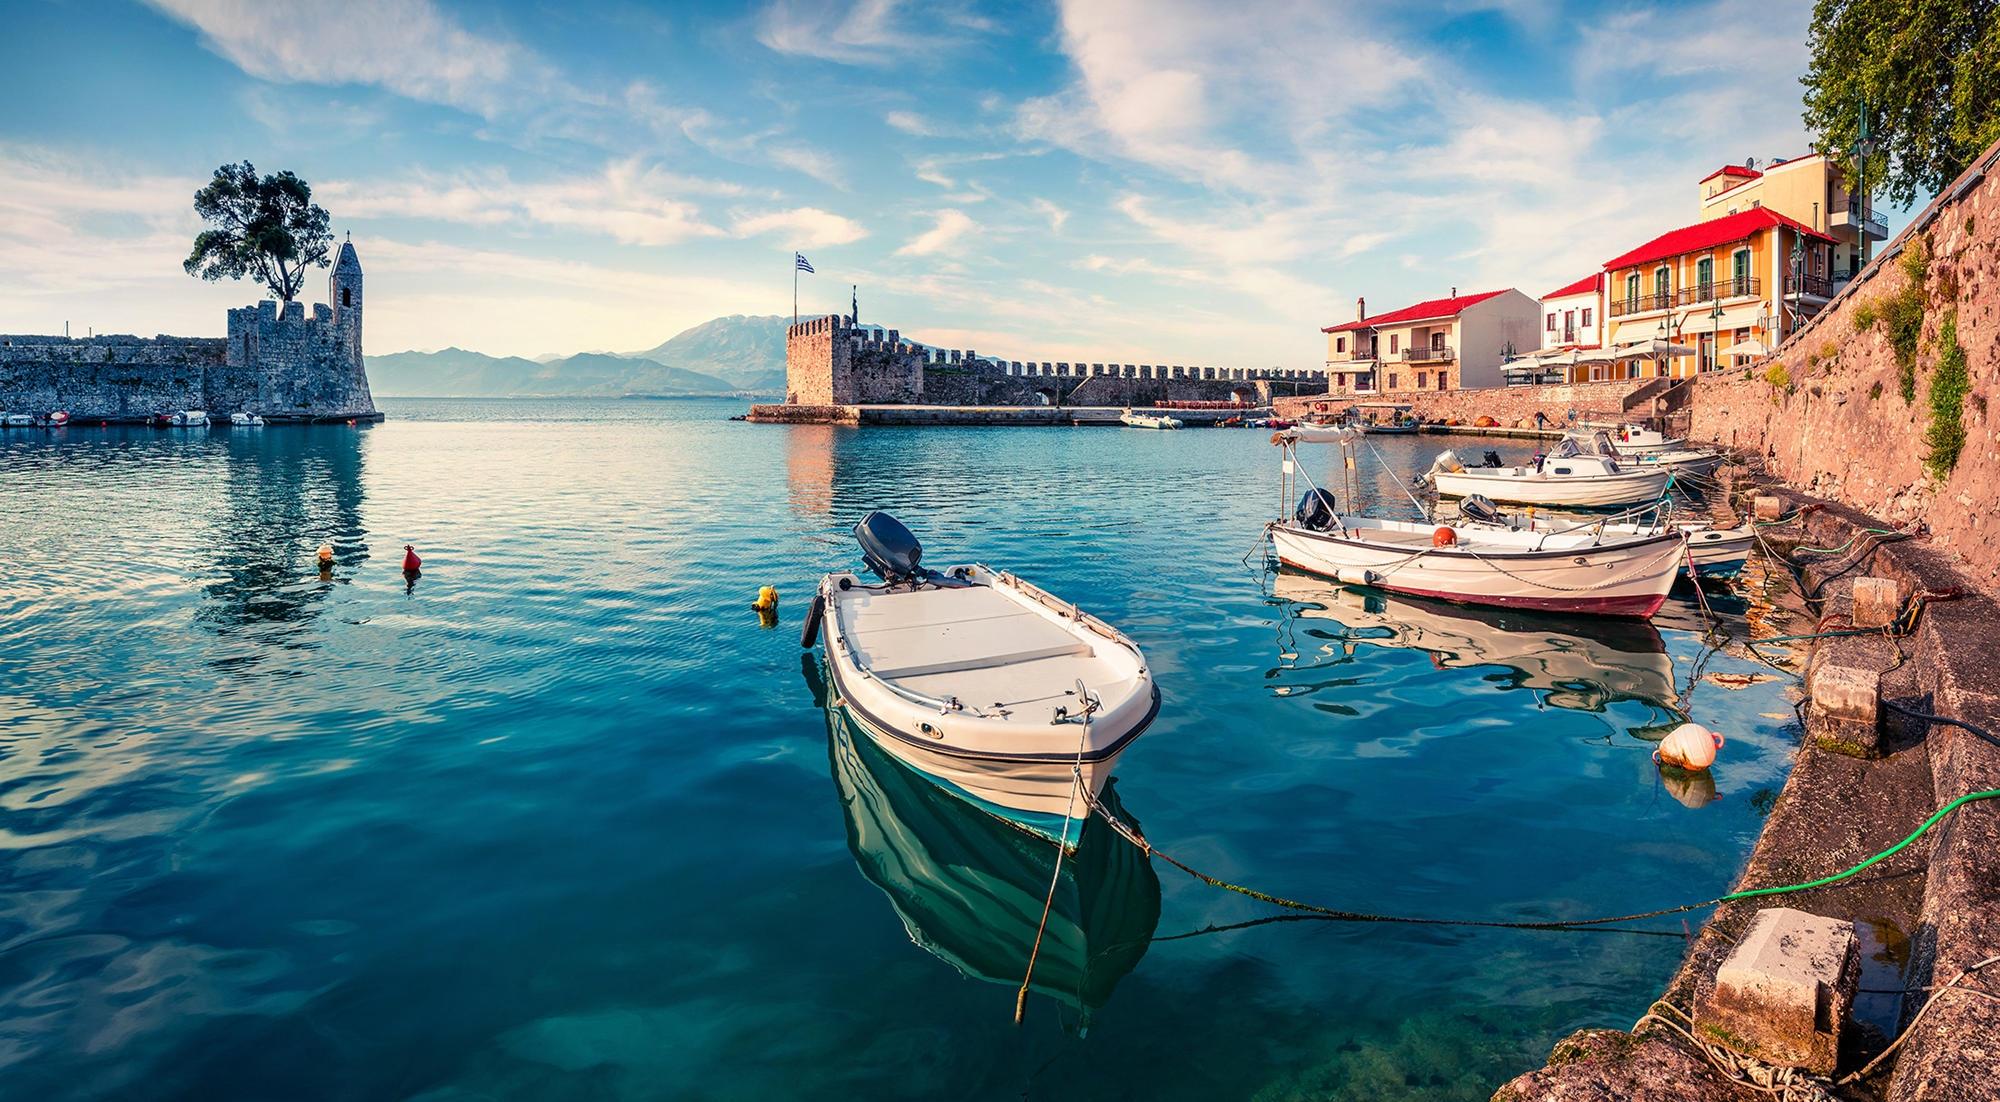 Nafpaktos, Greece - Discover Greece in 9 days tour from Igoumenitsa. UNESCO sites, castles and monasteries. Monterrasol Travel small group car tour.